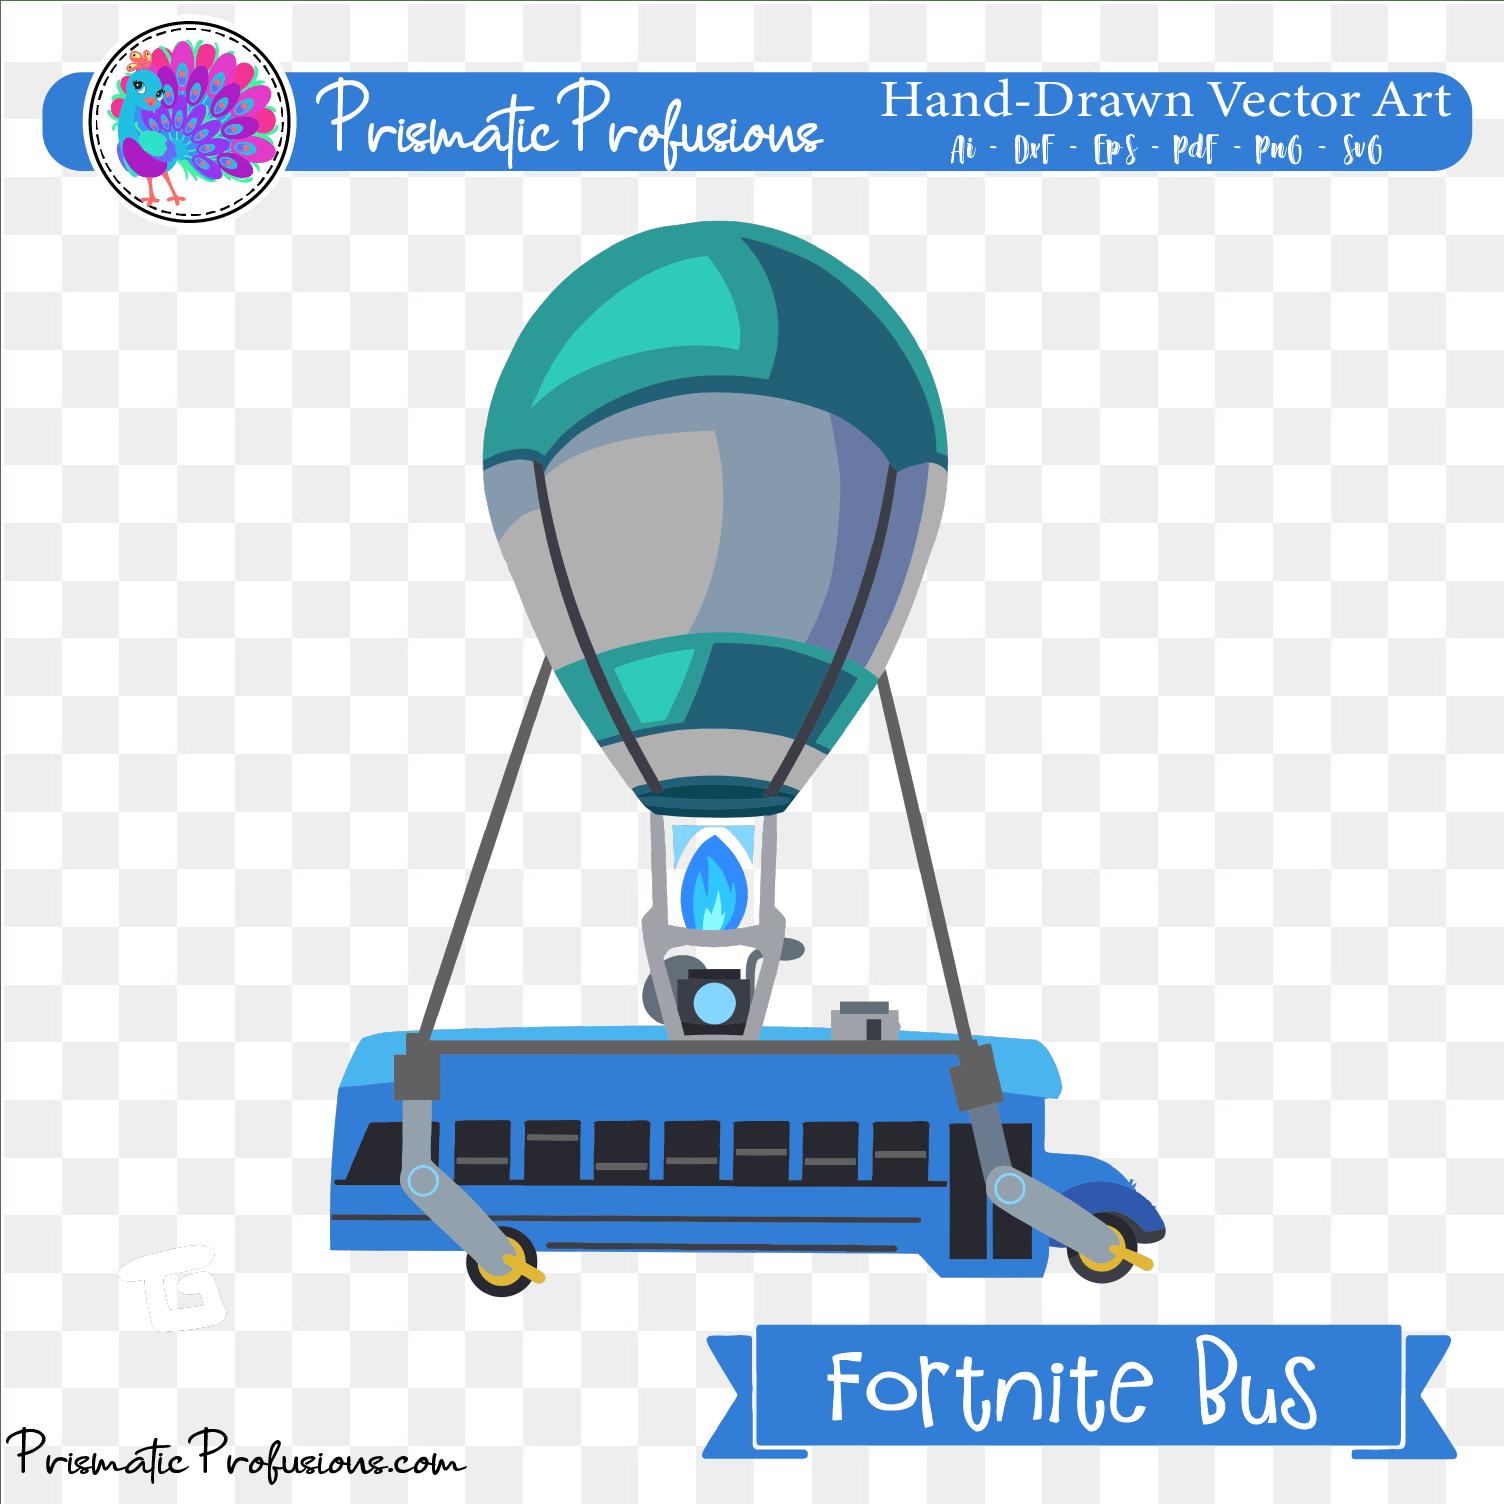 Fortnite Bus, Fortnite Bus SVG, Fortnite Bus Clipart.